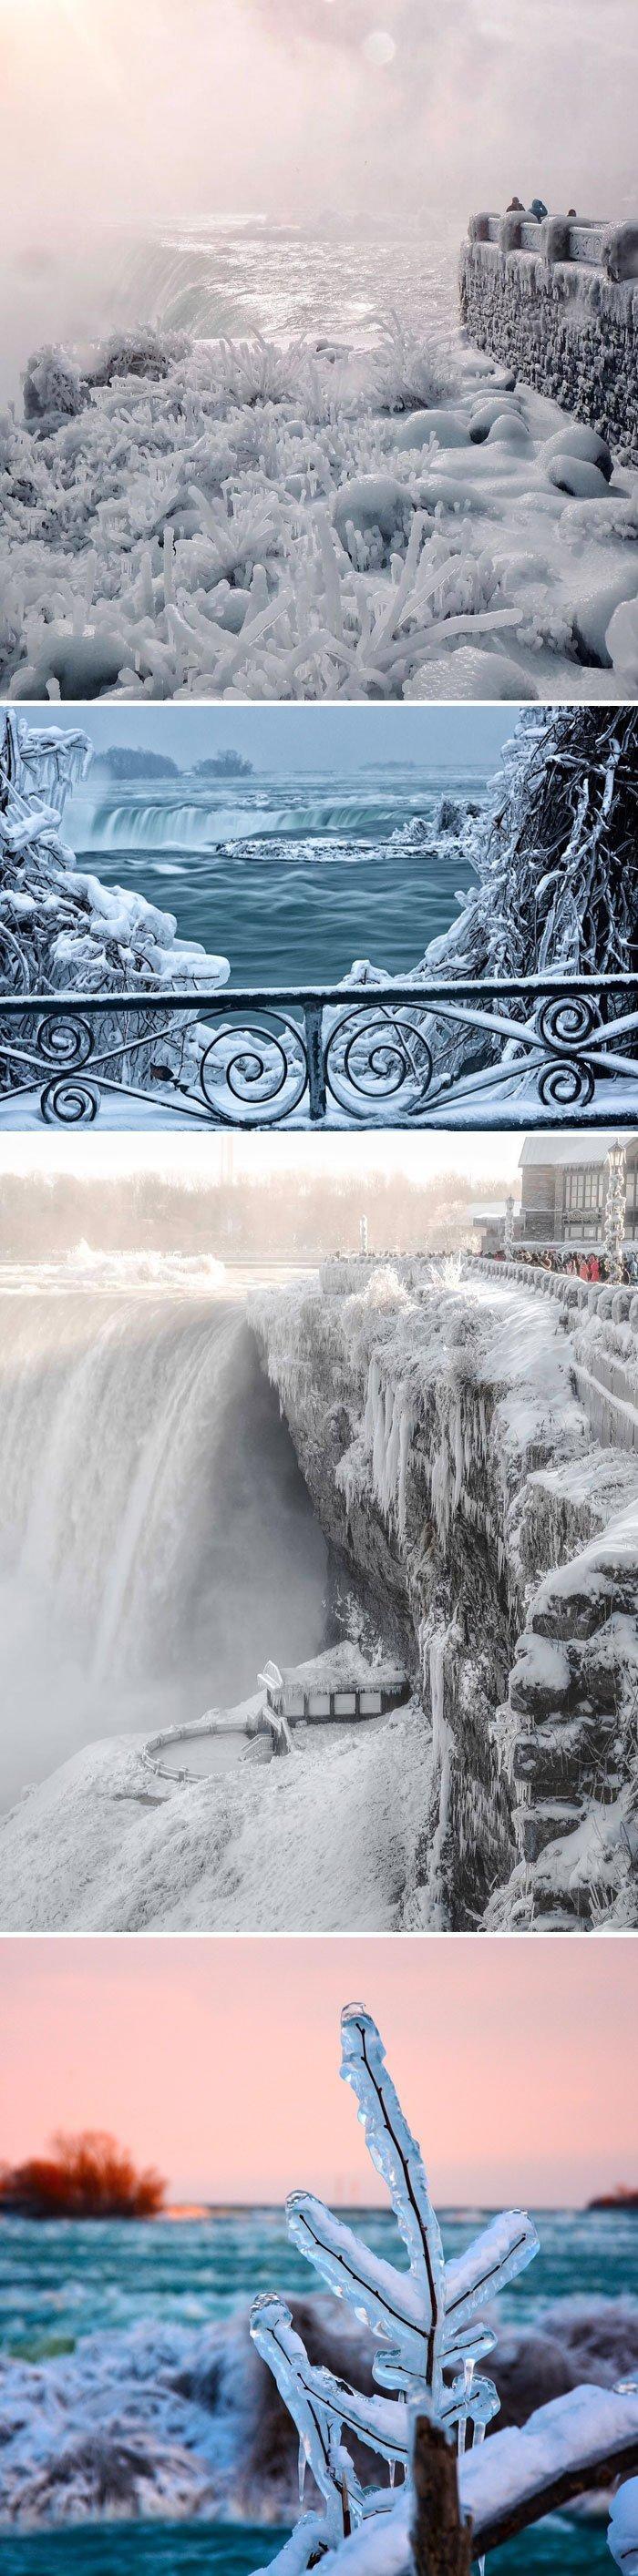 4. Ниагарский водопад замерз канада, мороз, погода, сша, фото, холод, явление